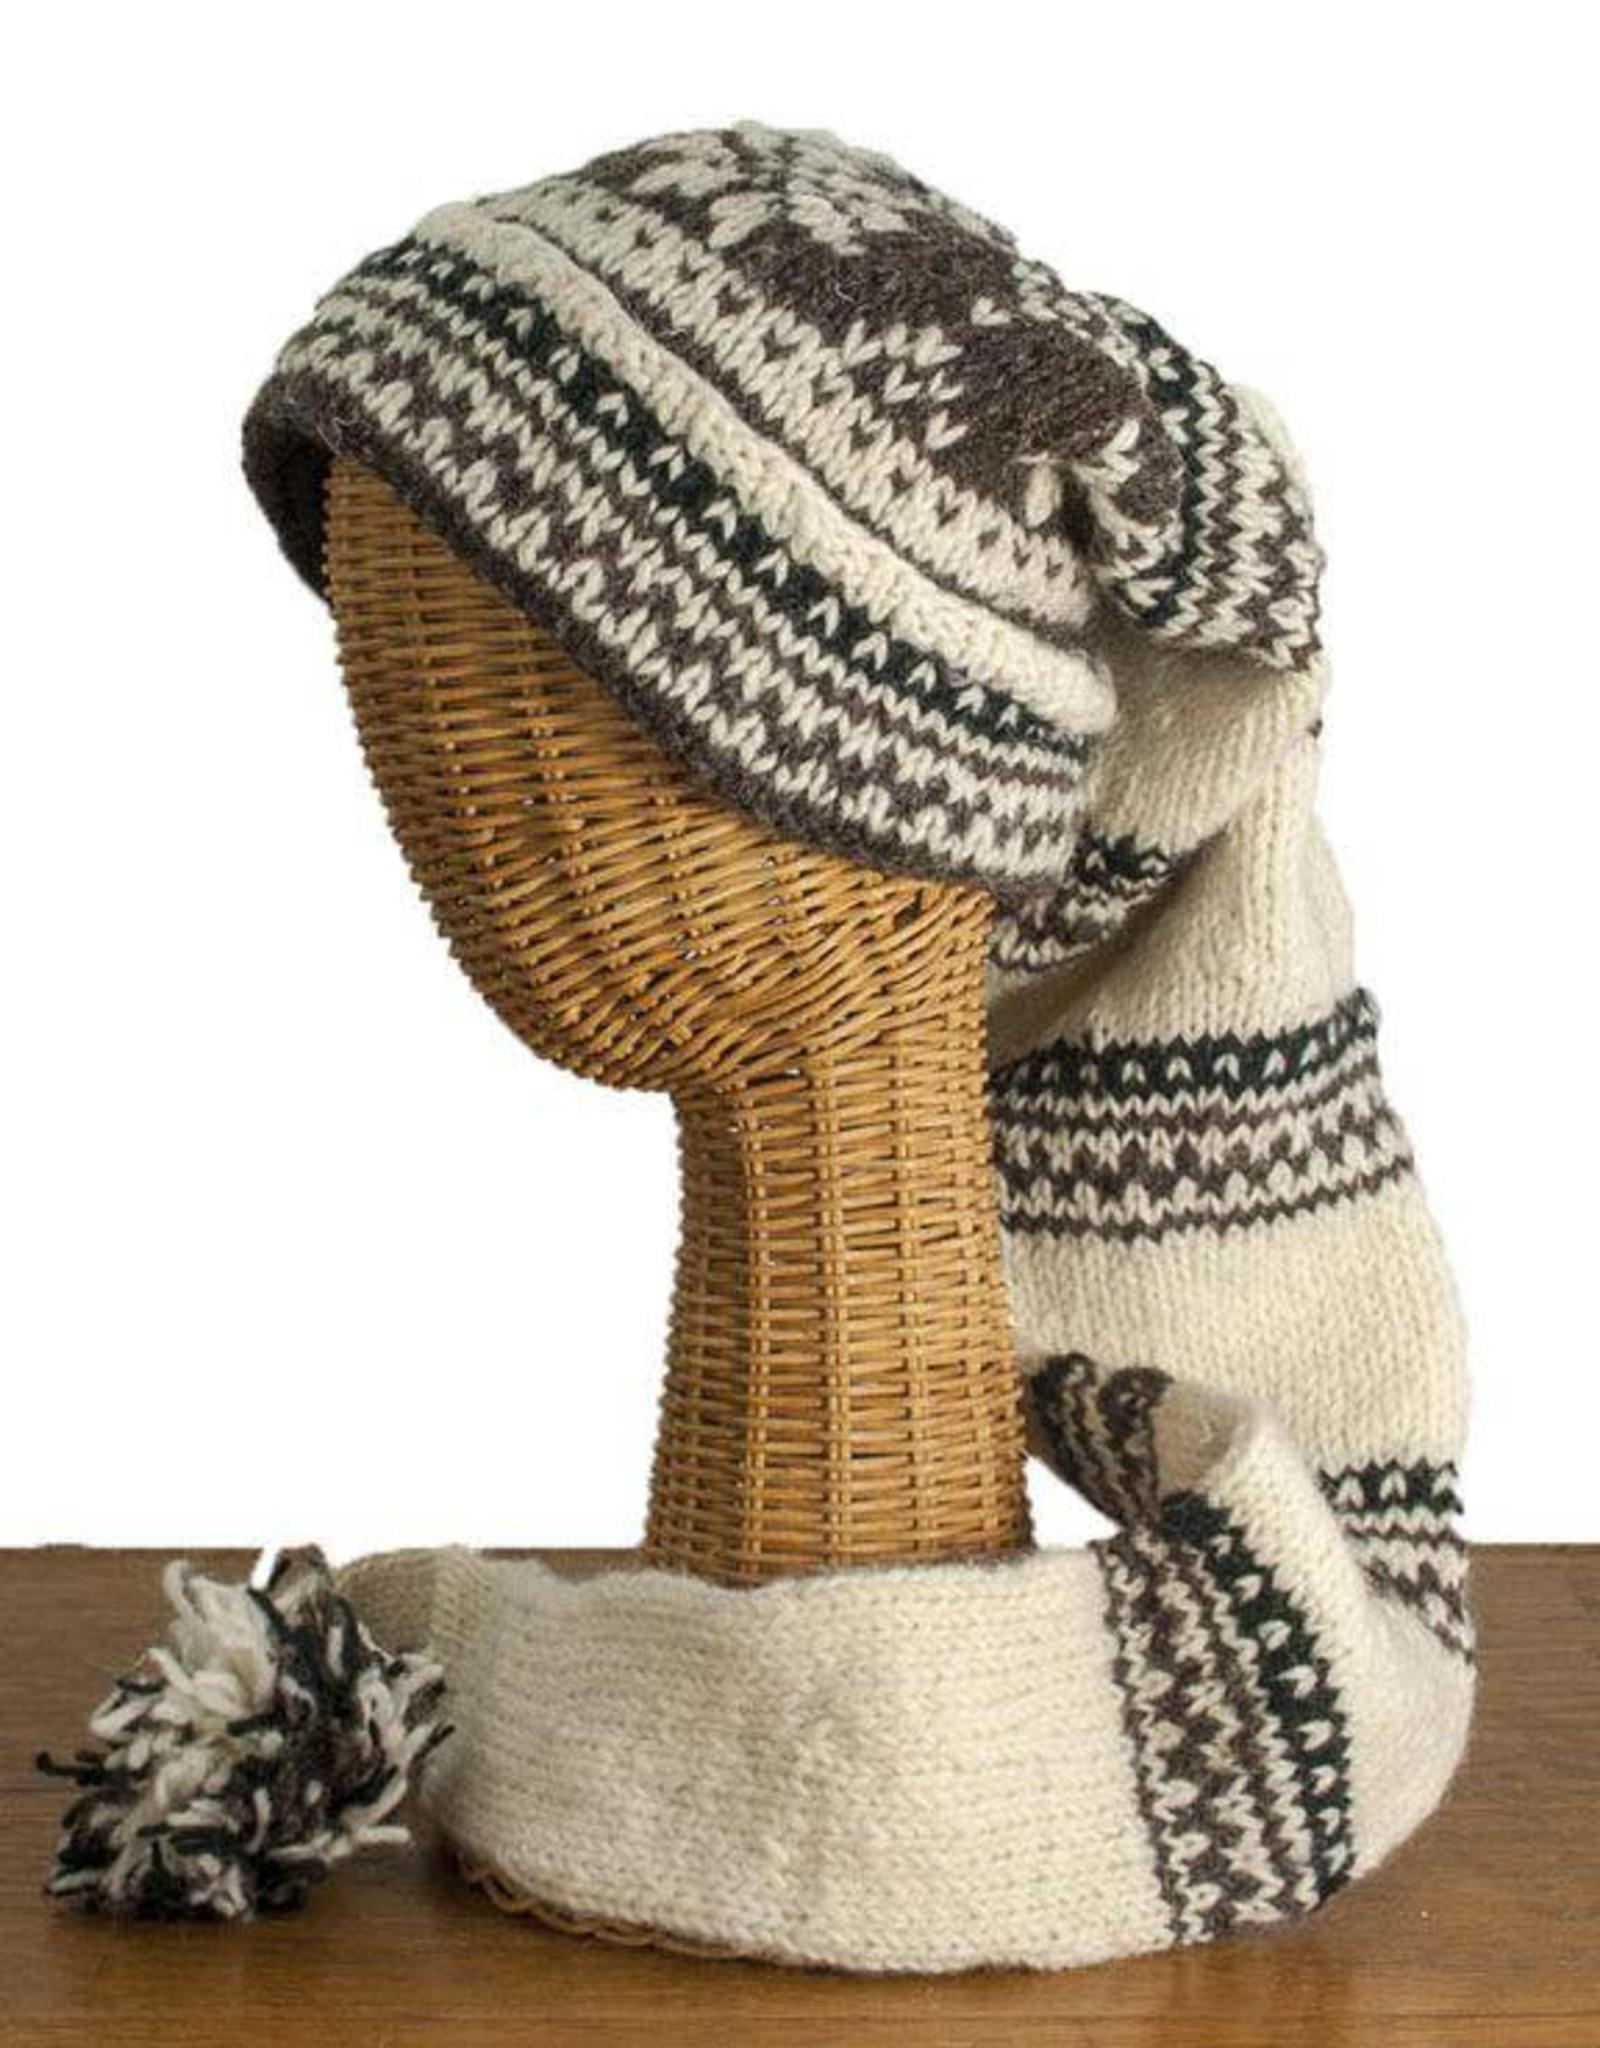 The Sweater Venture Snowfox Fleece Lined Stocking Cap